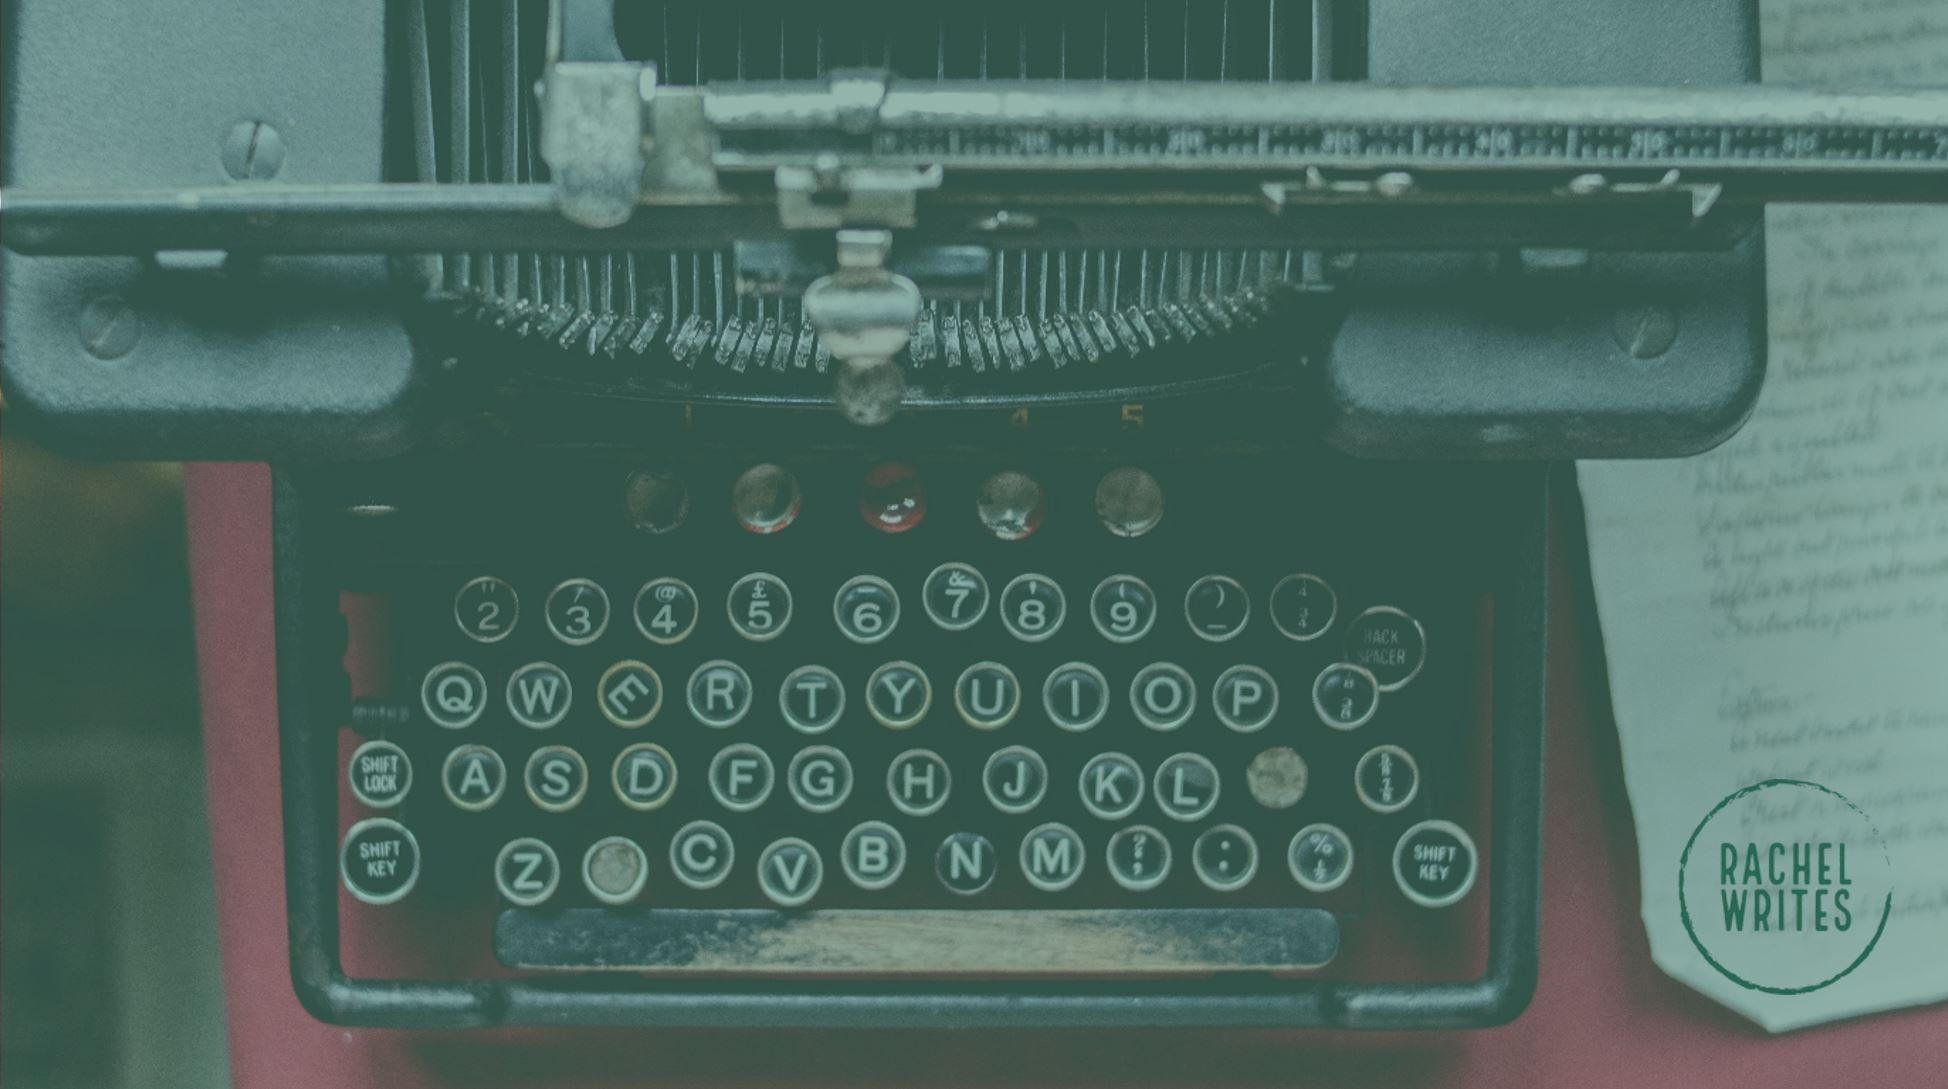 Rachel Writes content can image